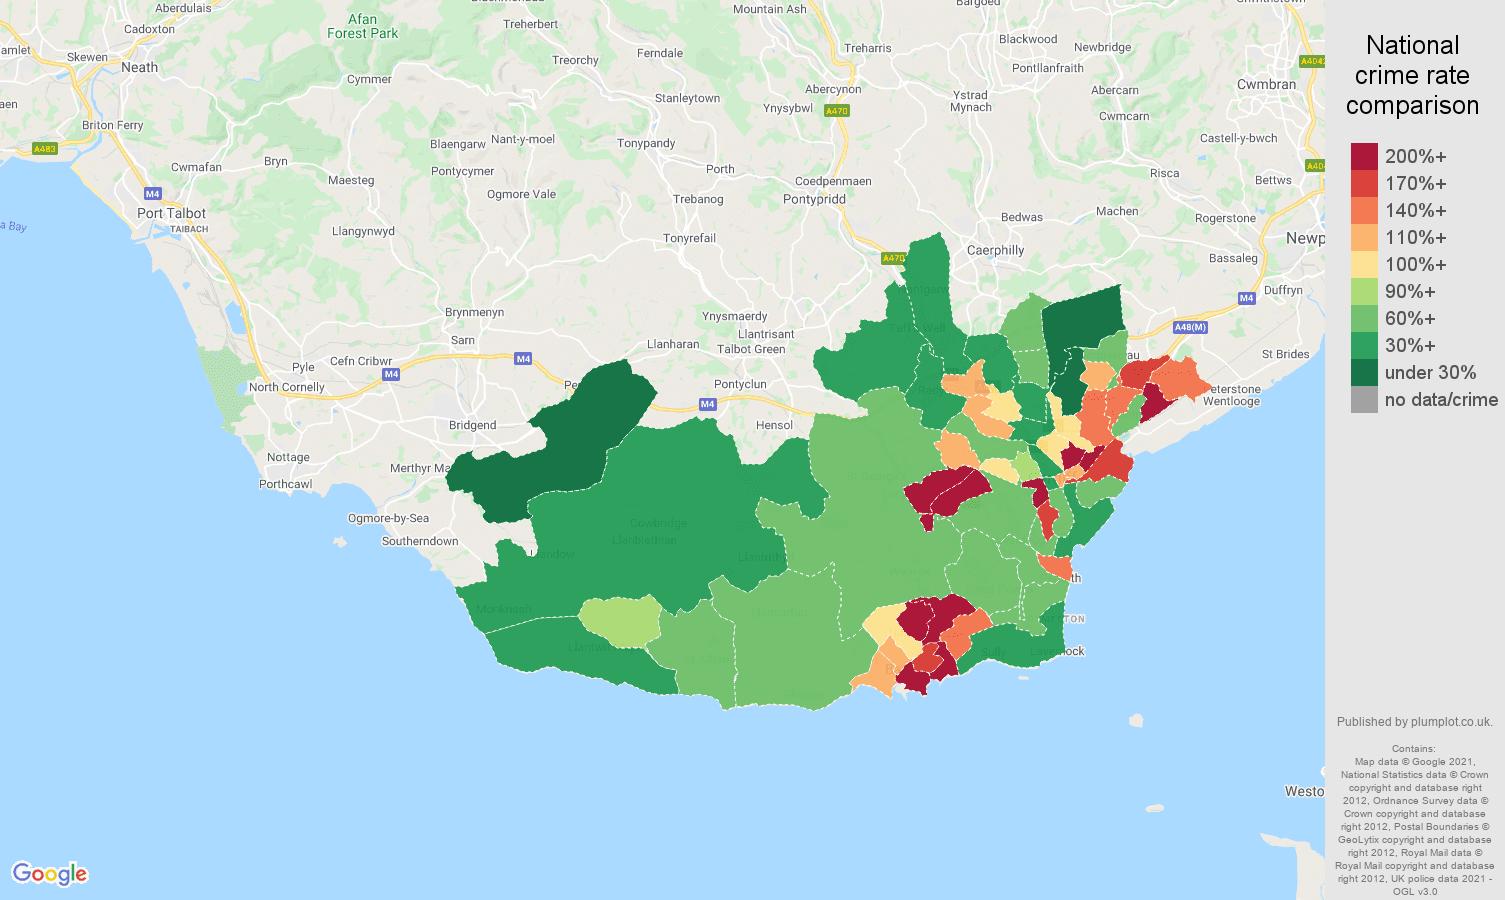 South Glamorgan criminal damage and arson crime rate comparison map